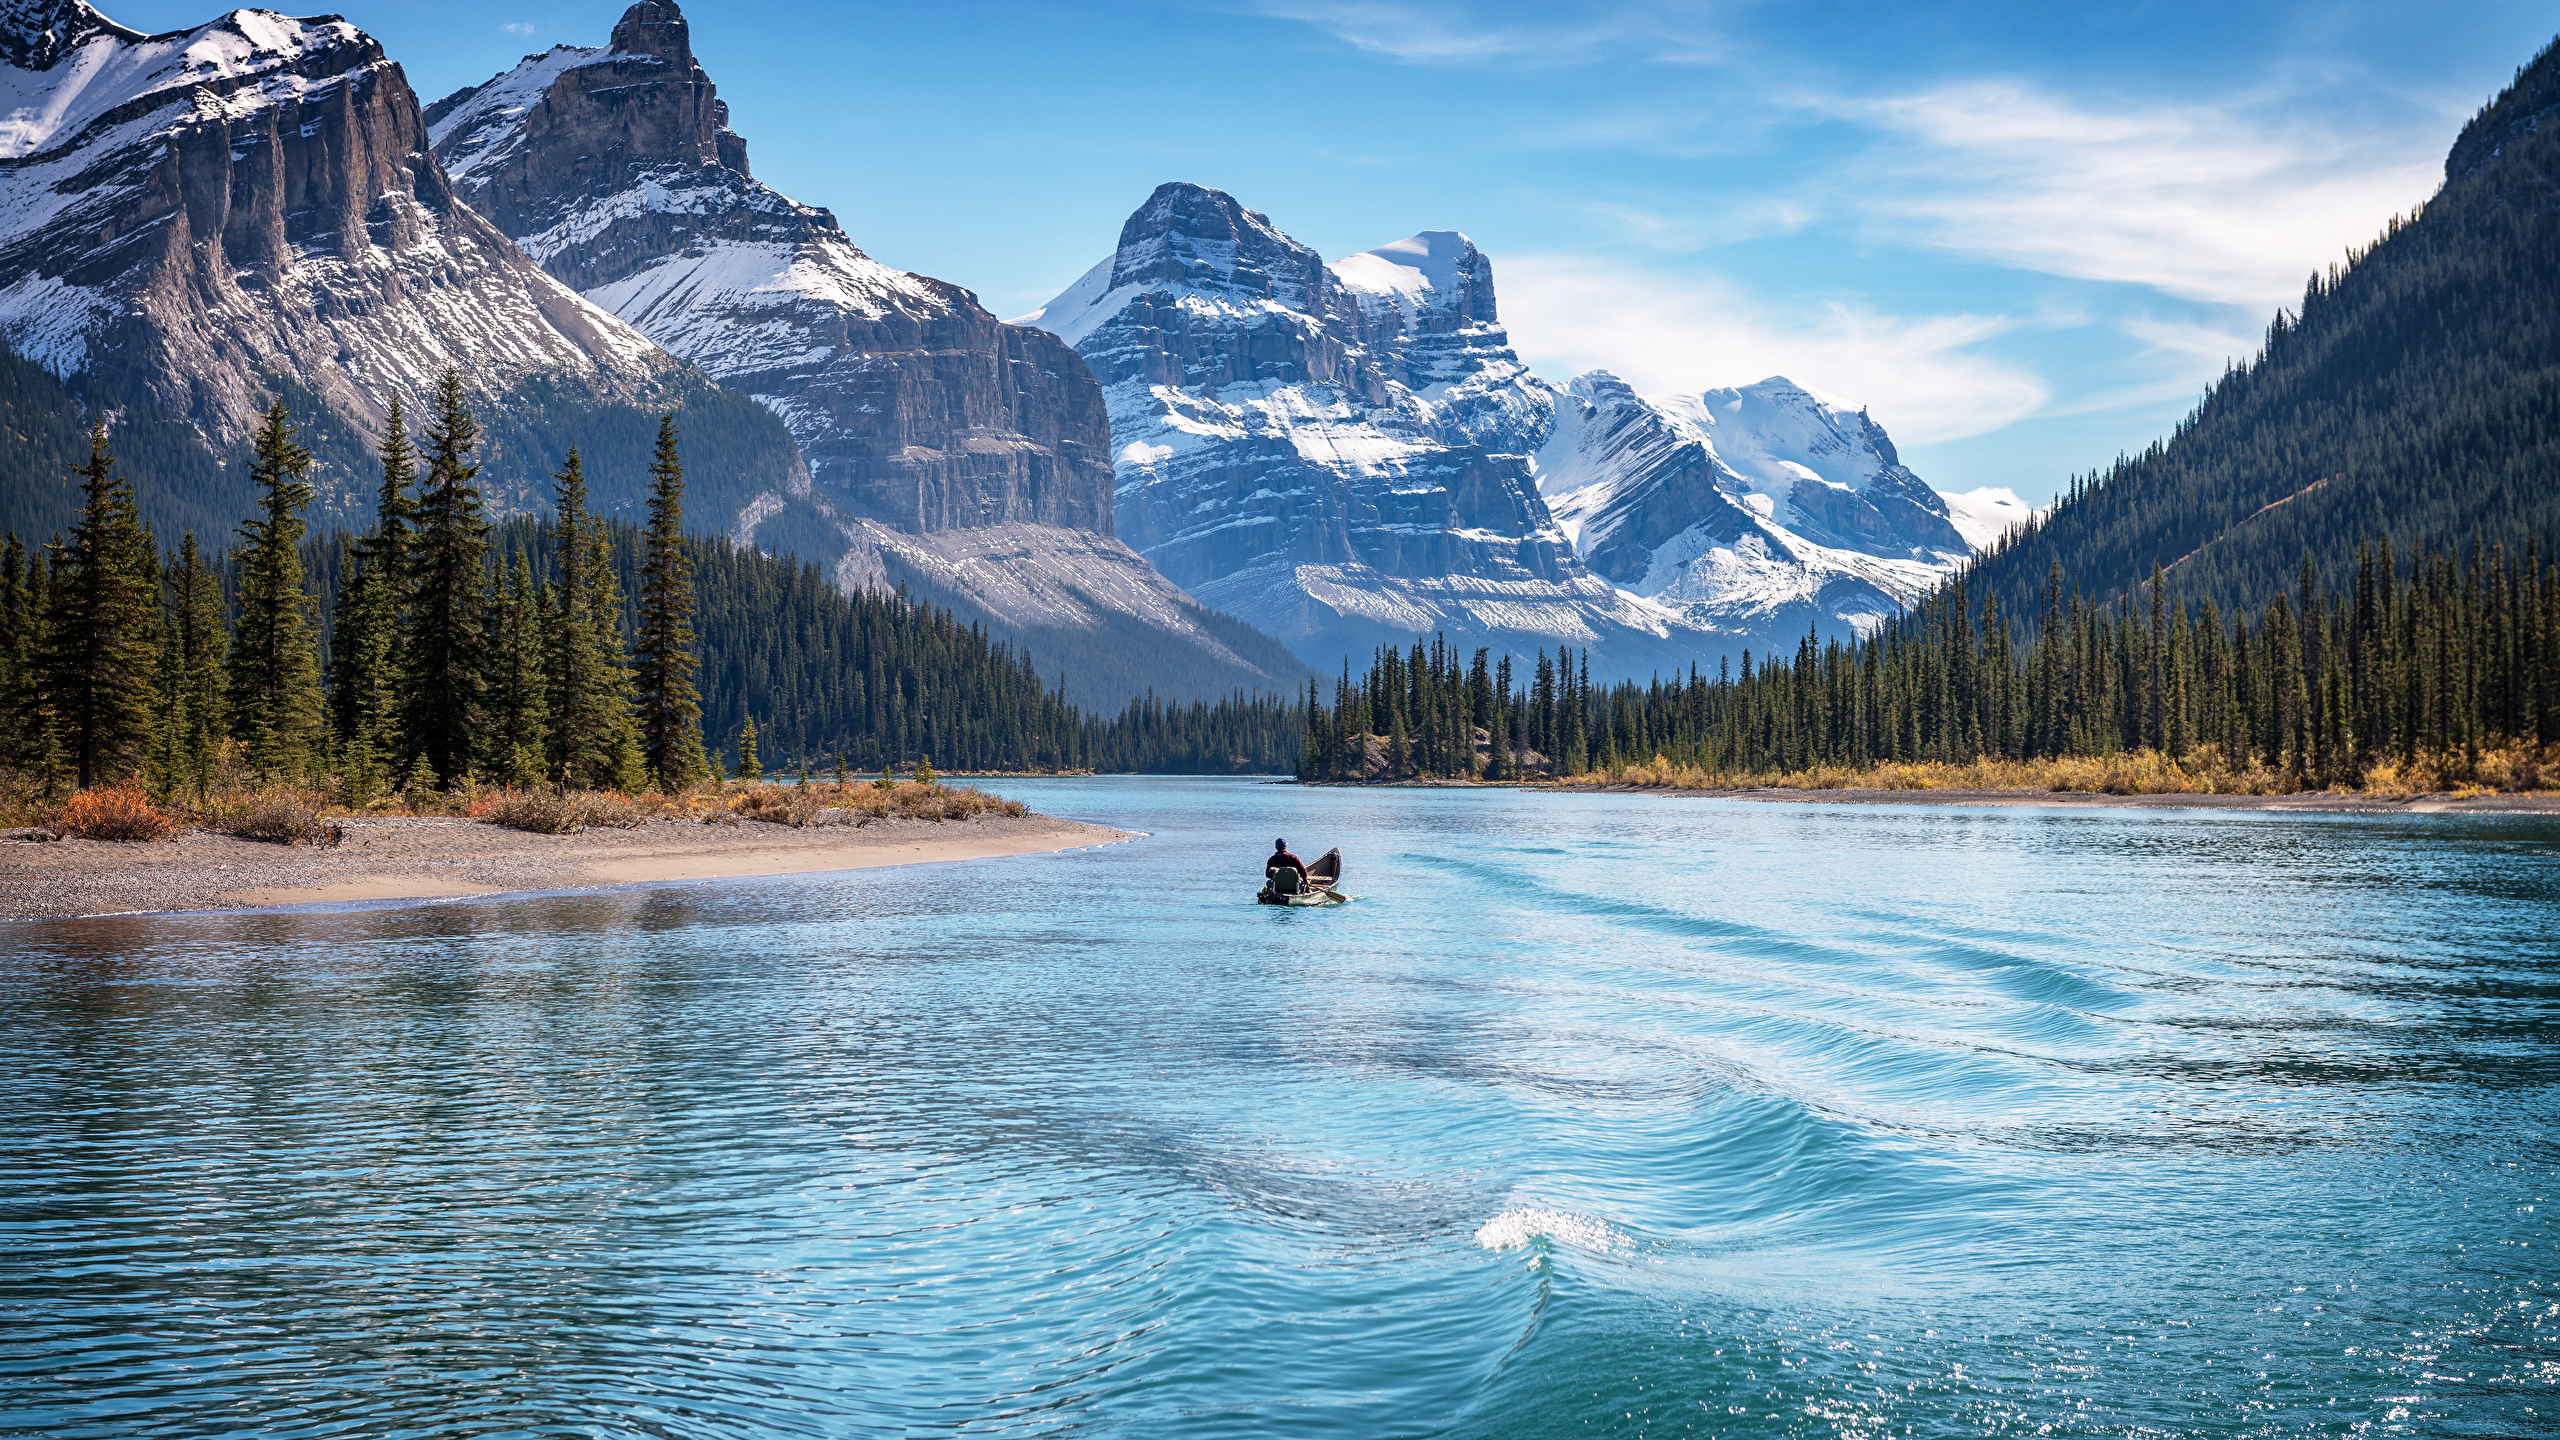 Картинка Джаспер парк Канада Lake Maligne, Alberta гора Природа парк Озеро Пейзаж Лодки деревьев 2560x1440 Горы Парки дерево дерева Деревья